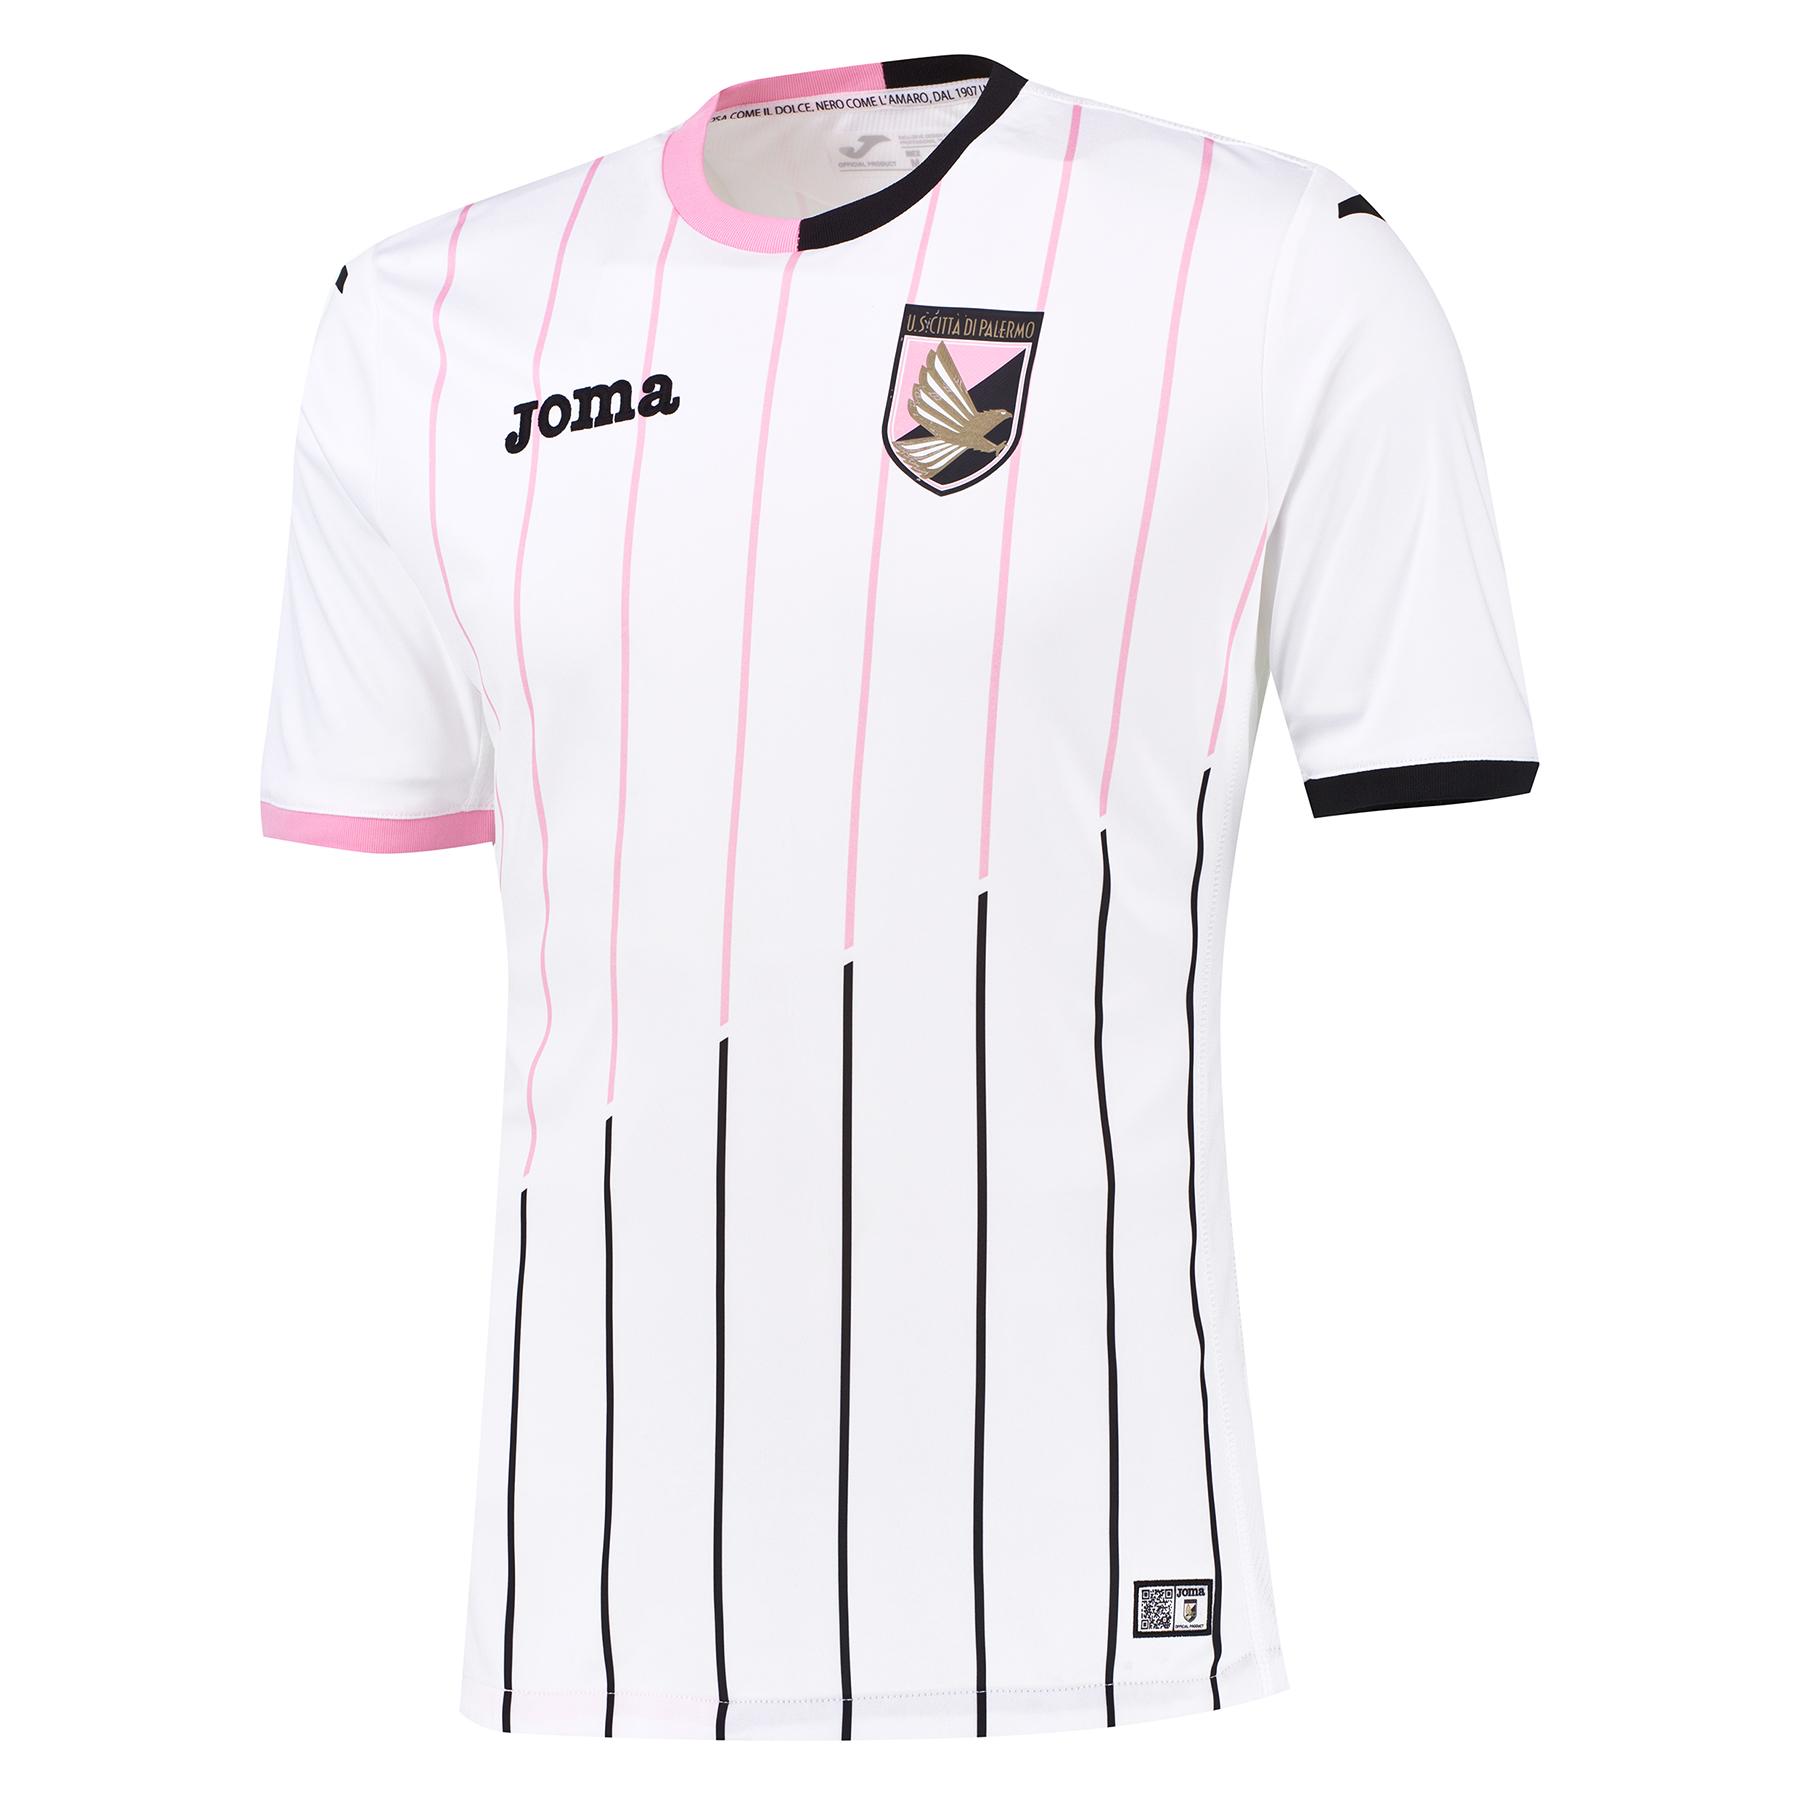 Image of Palermo Palermo Away Shirt 2015-16 White, White